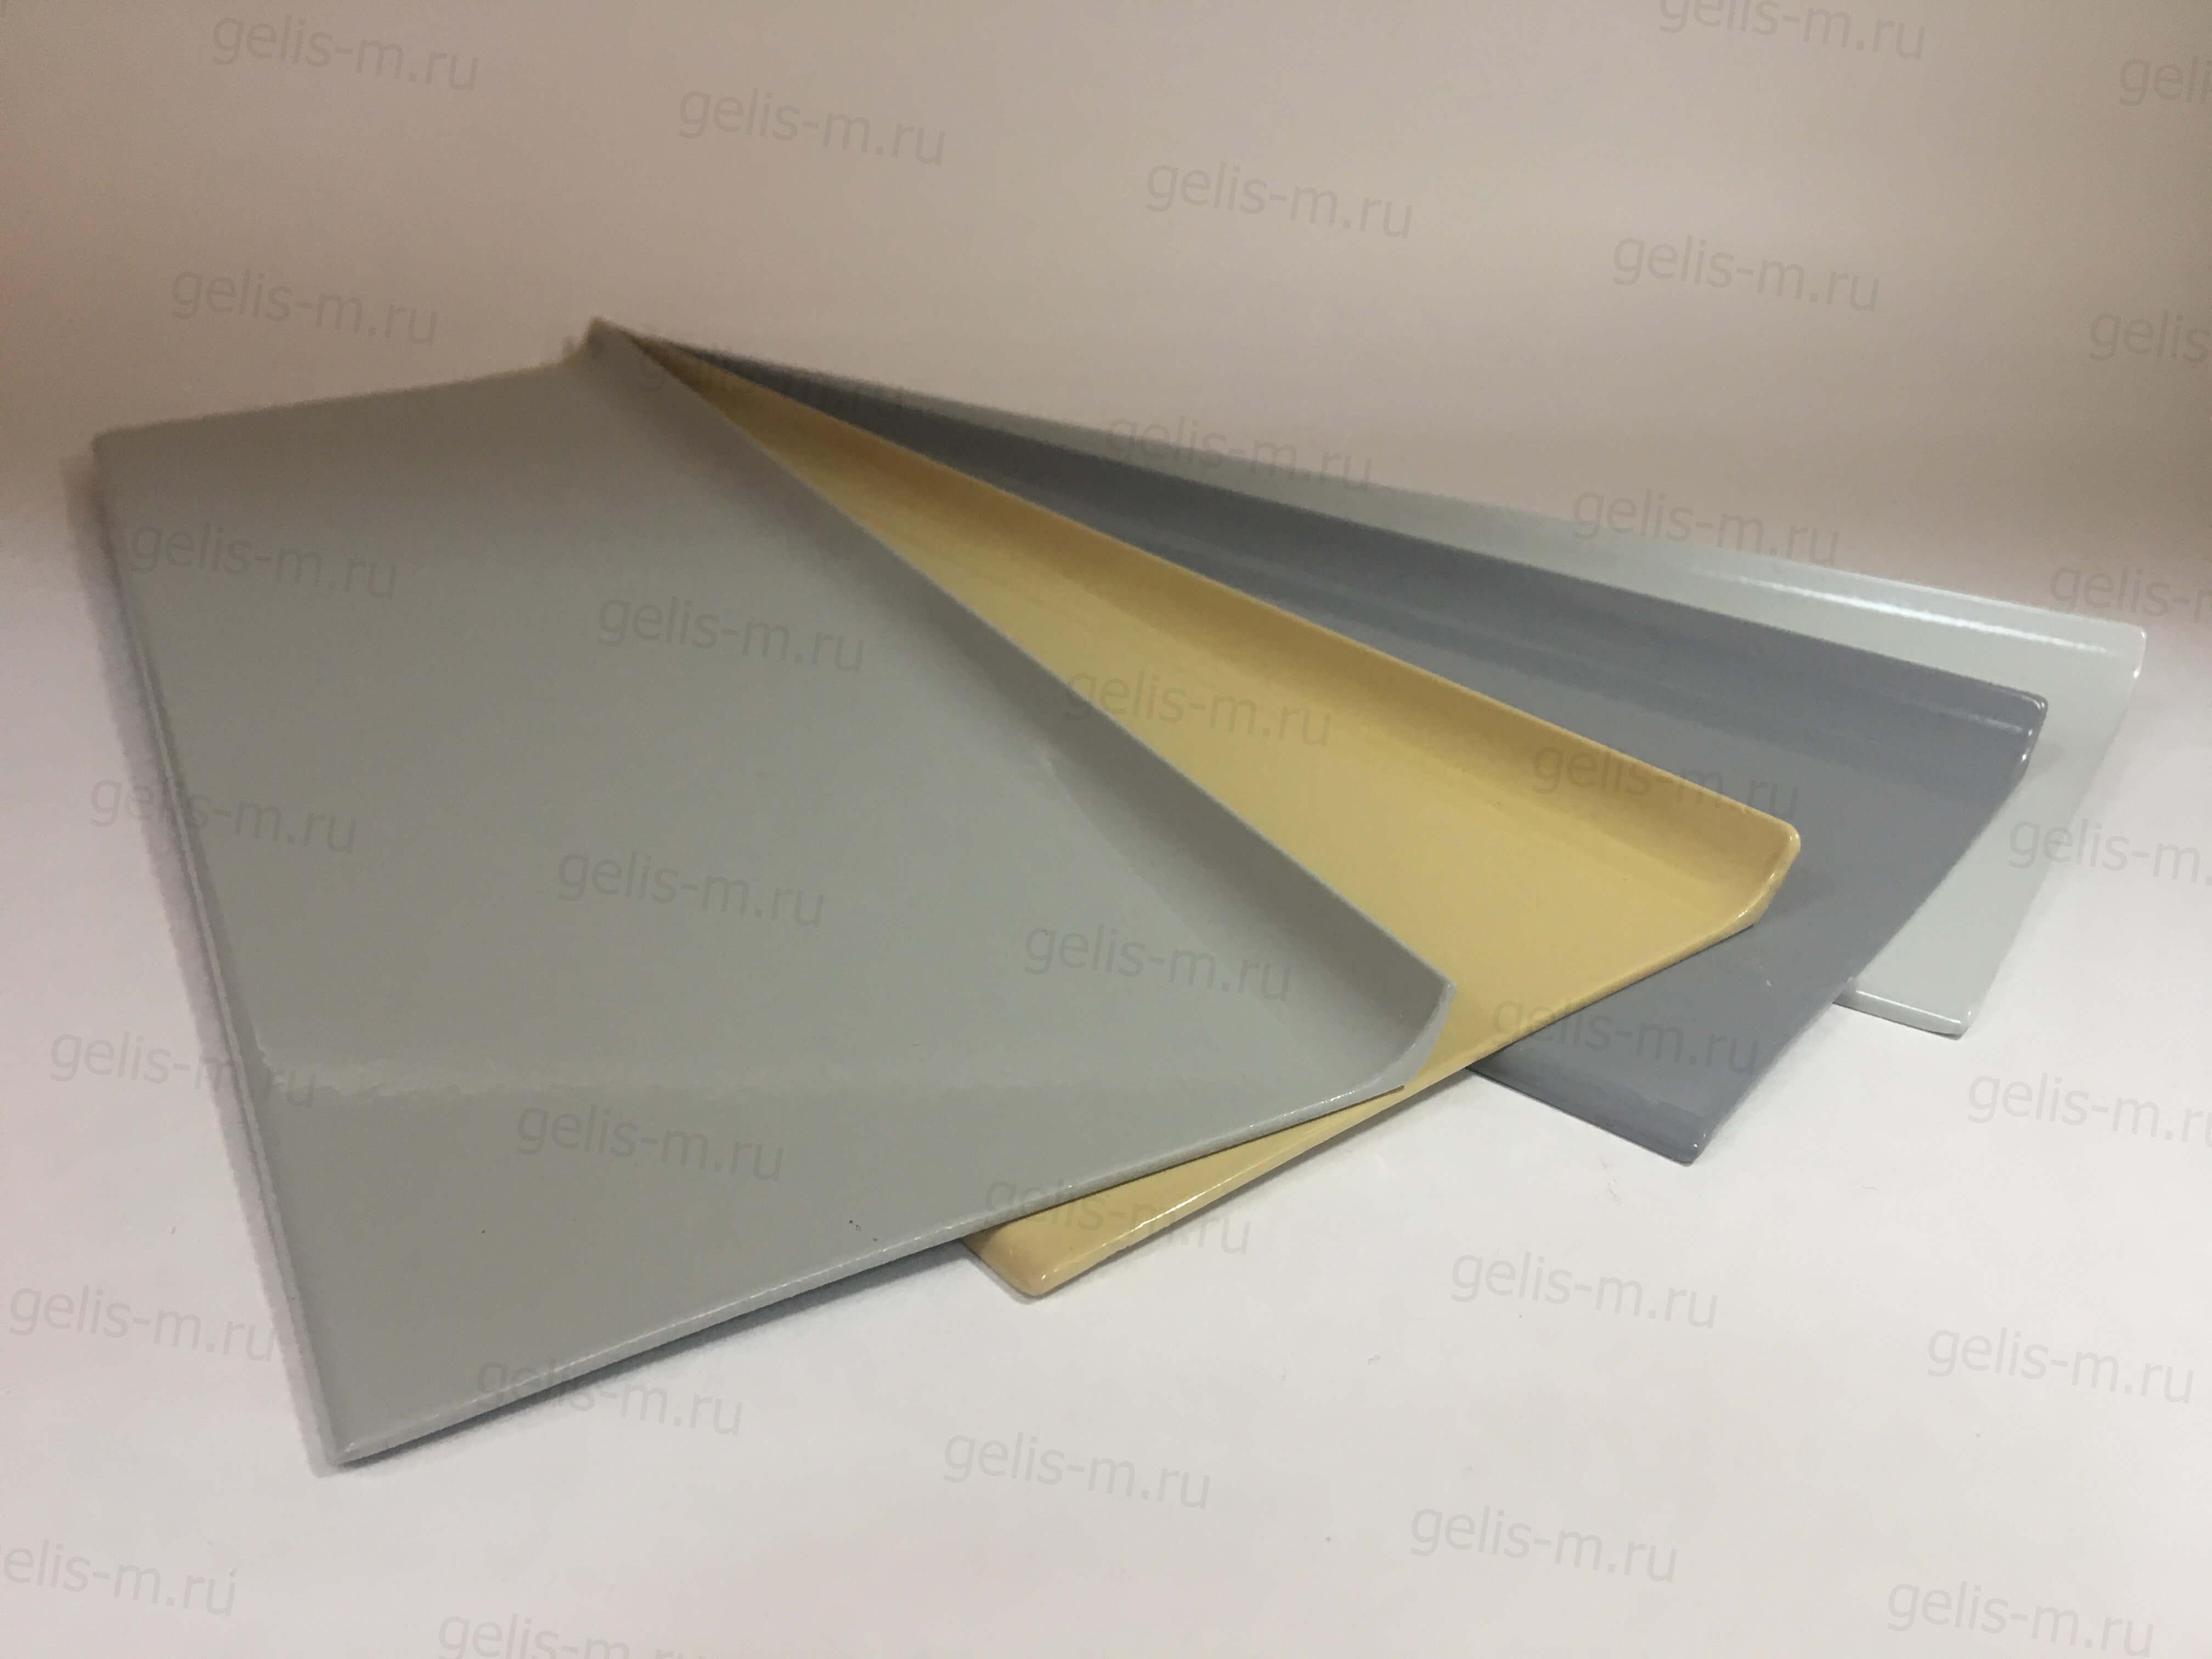 пример покраски алюминиевого плинтуса